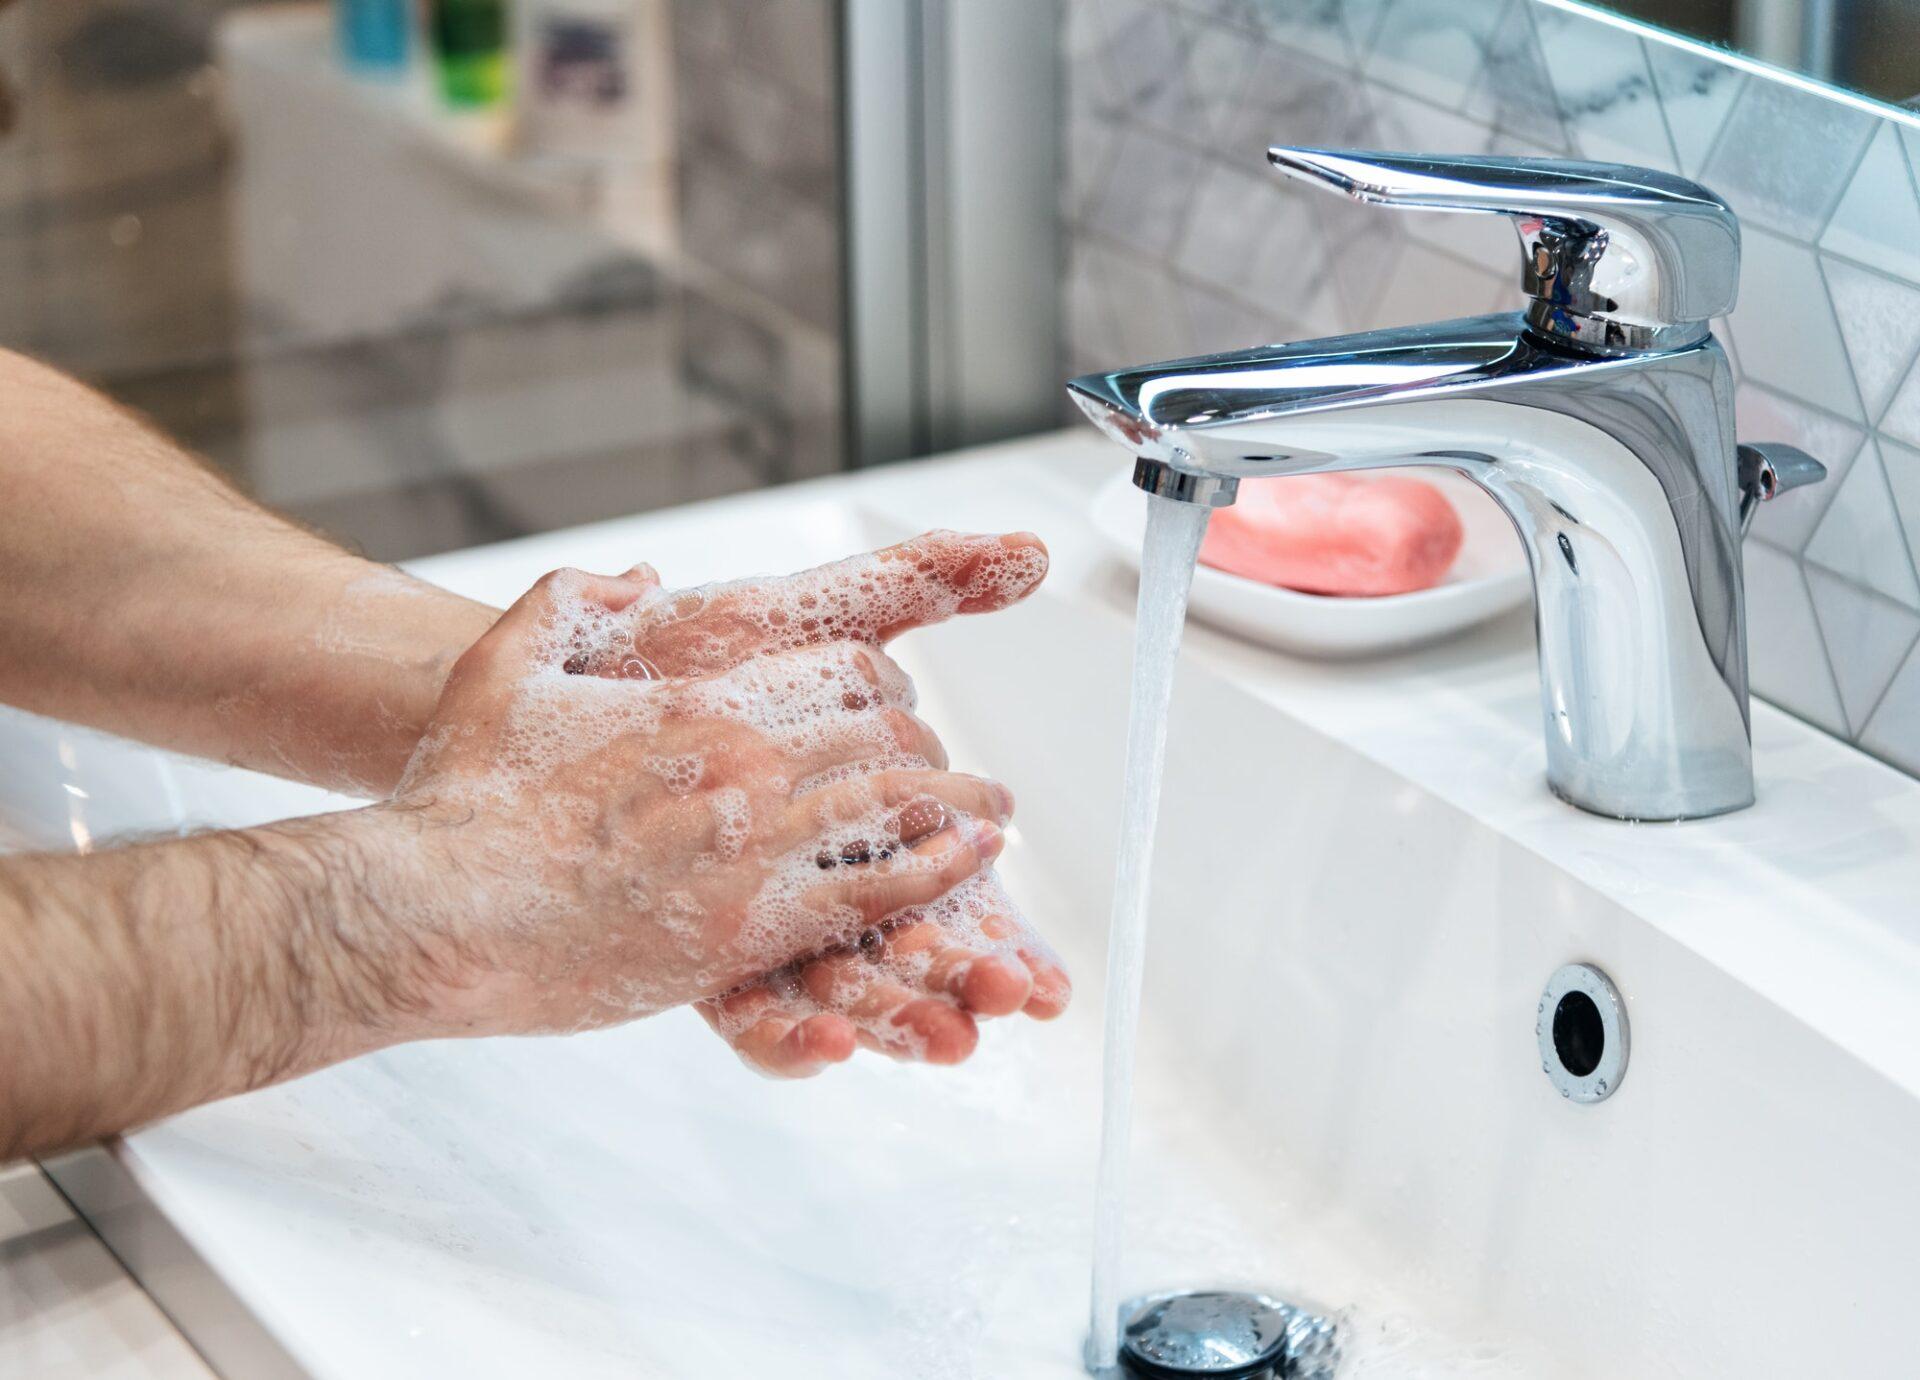 Man is washing hands with soap. Coronavirus pandemic. Covid-19